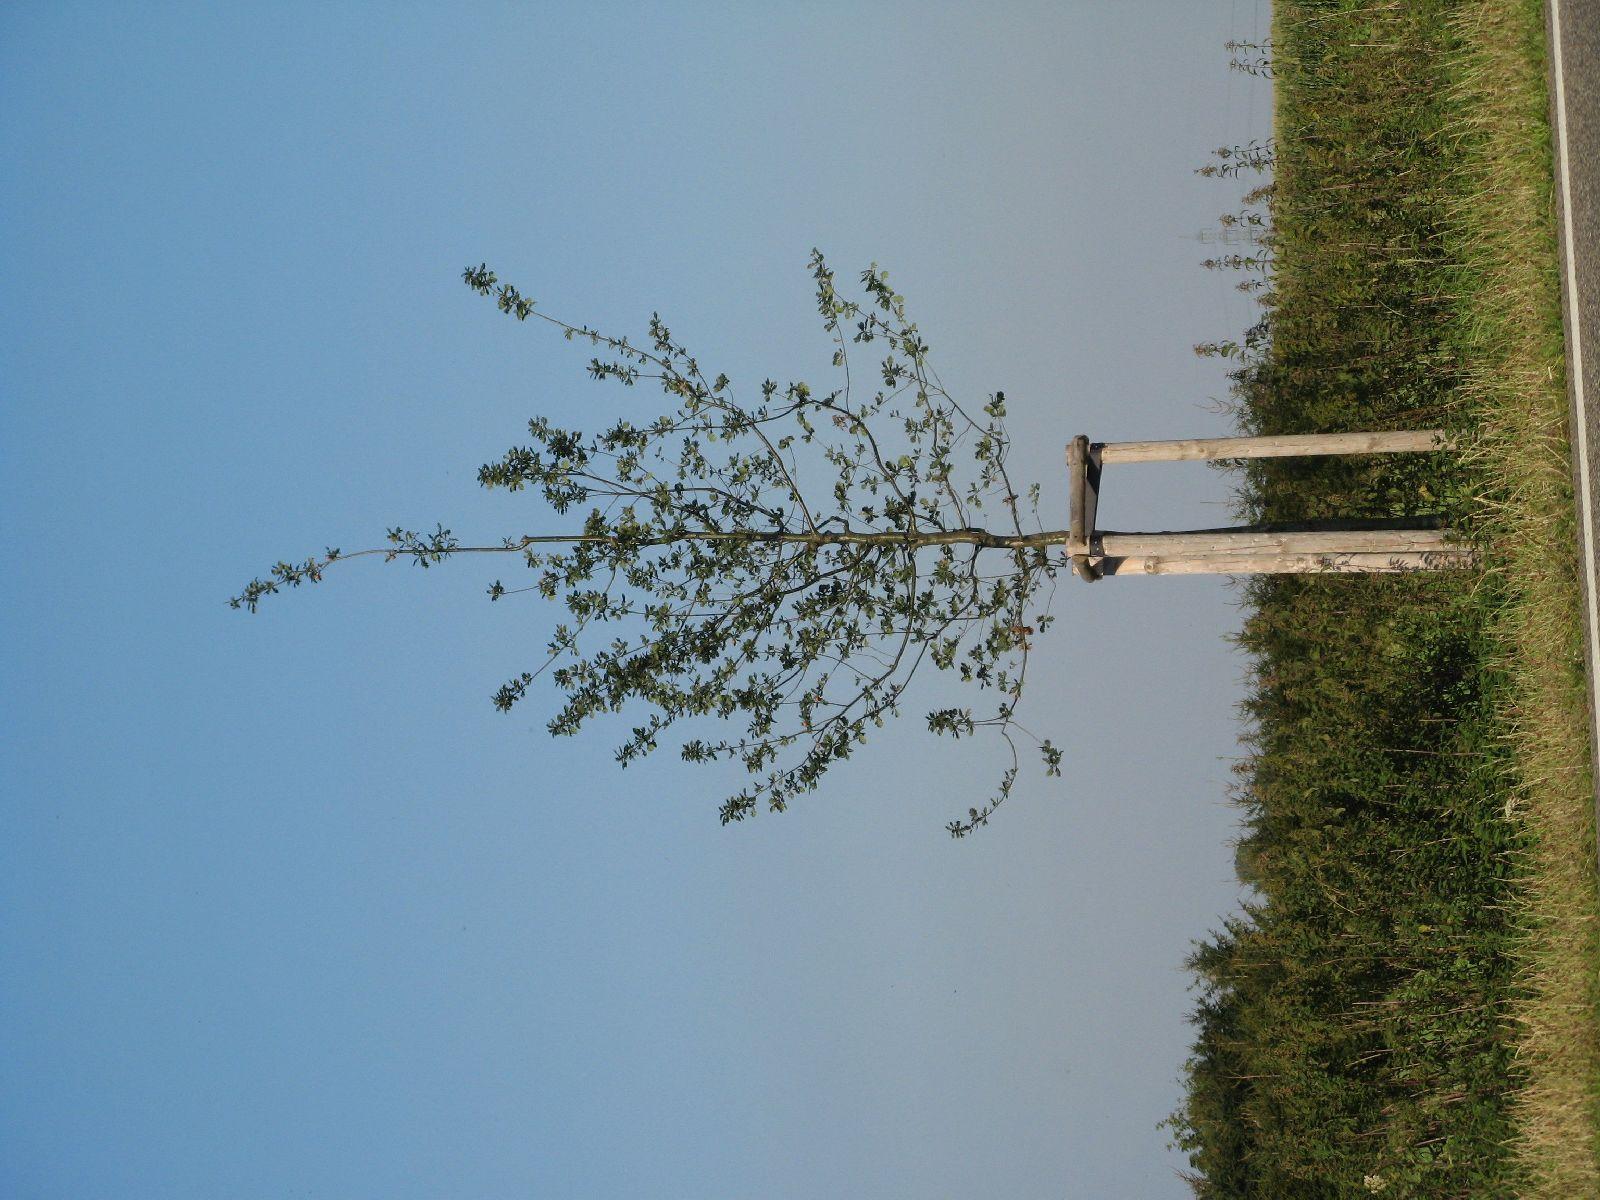 Plants-Trees_Photo_Texture_B_1250